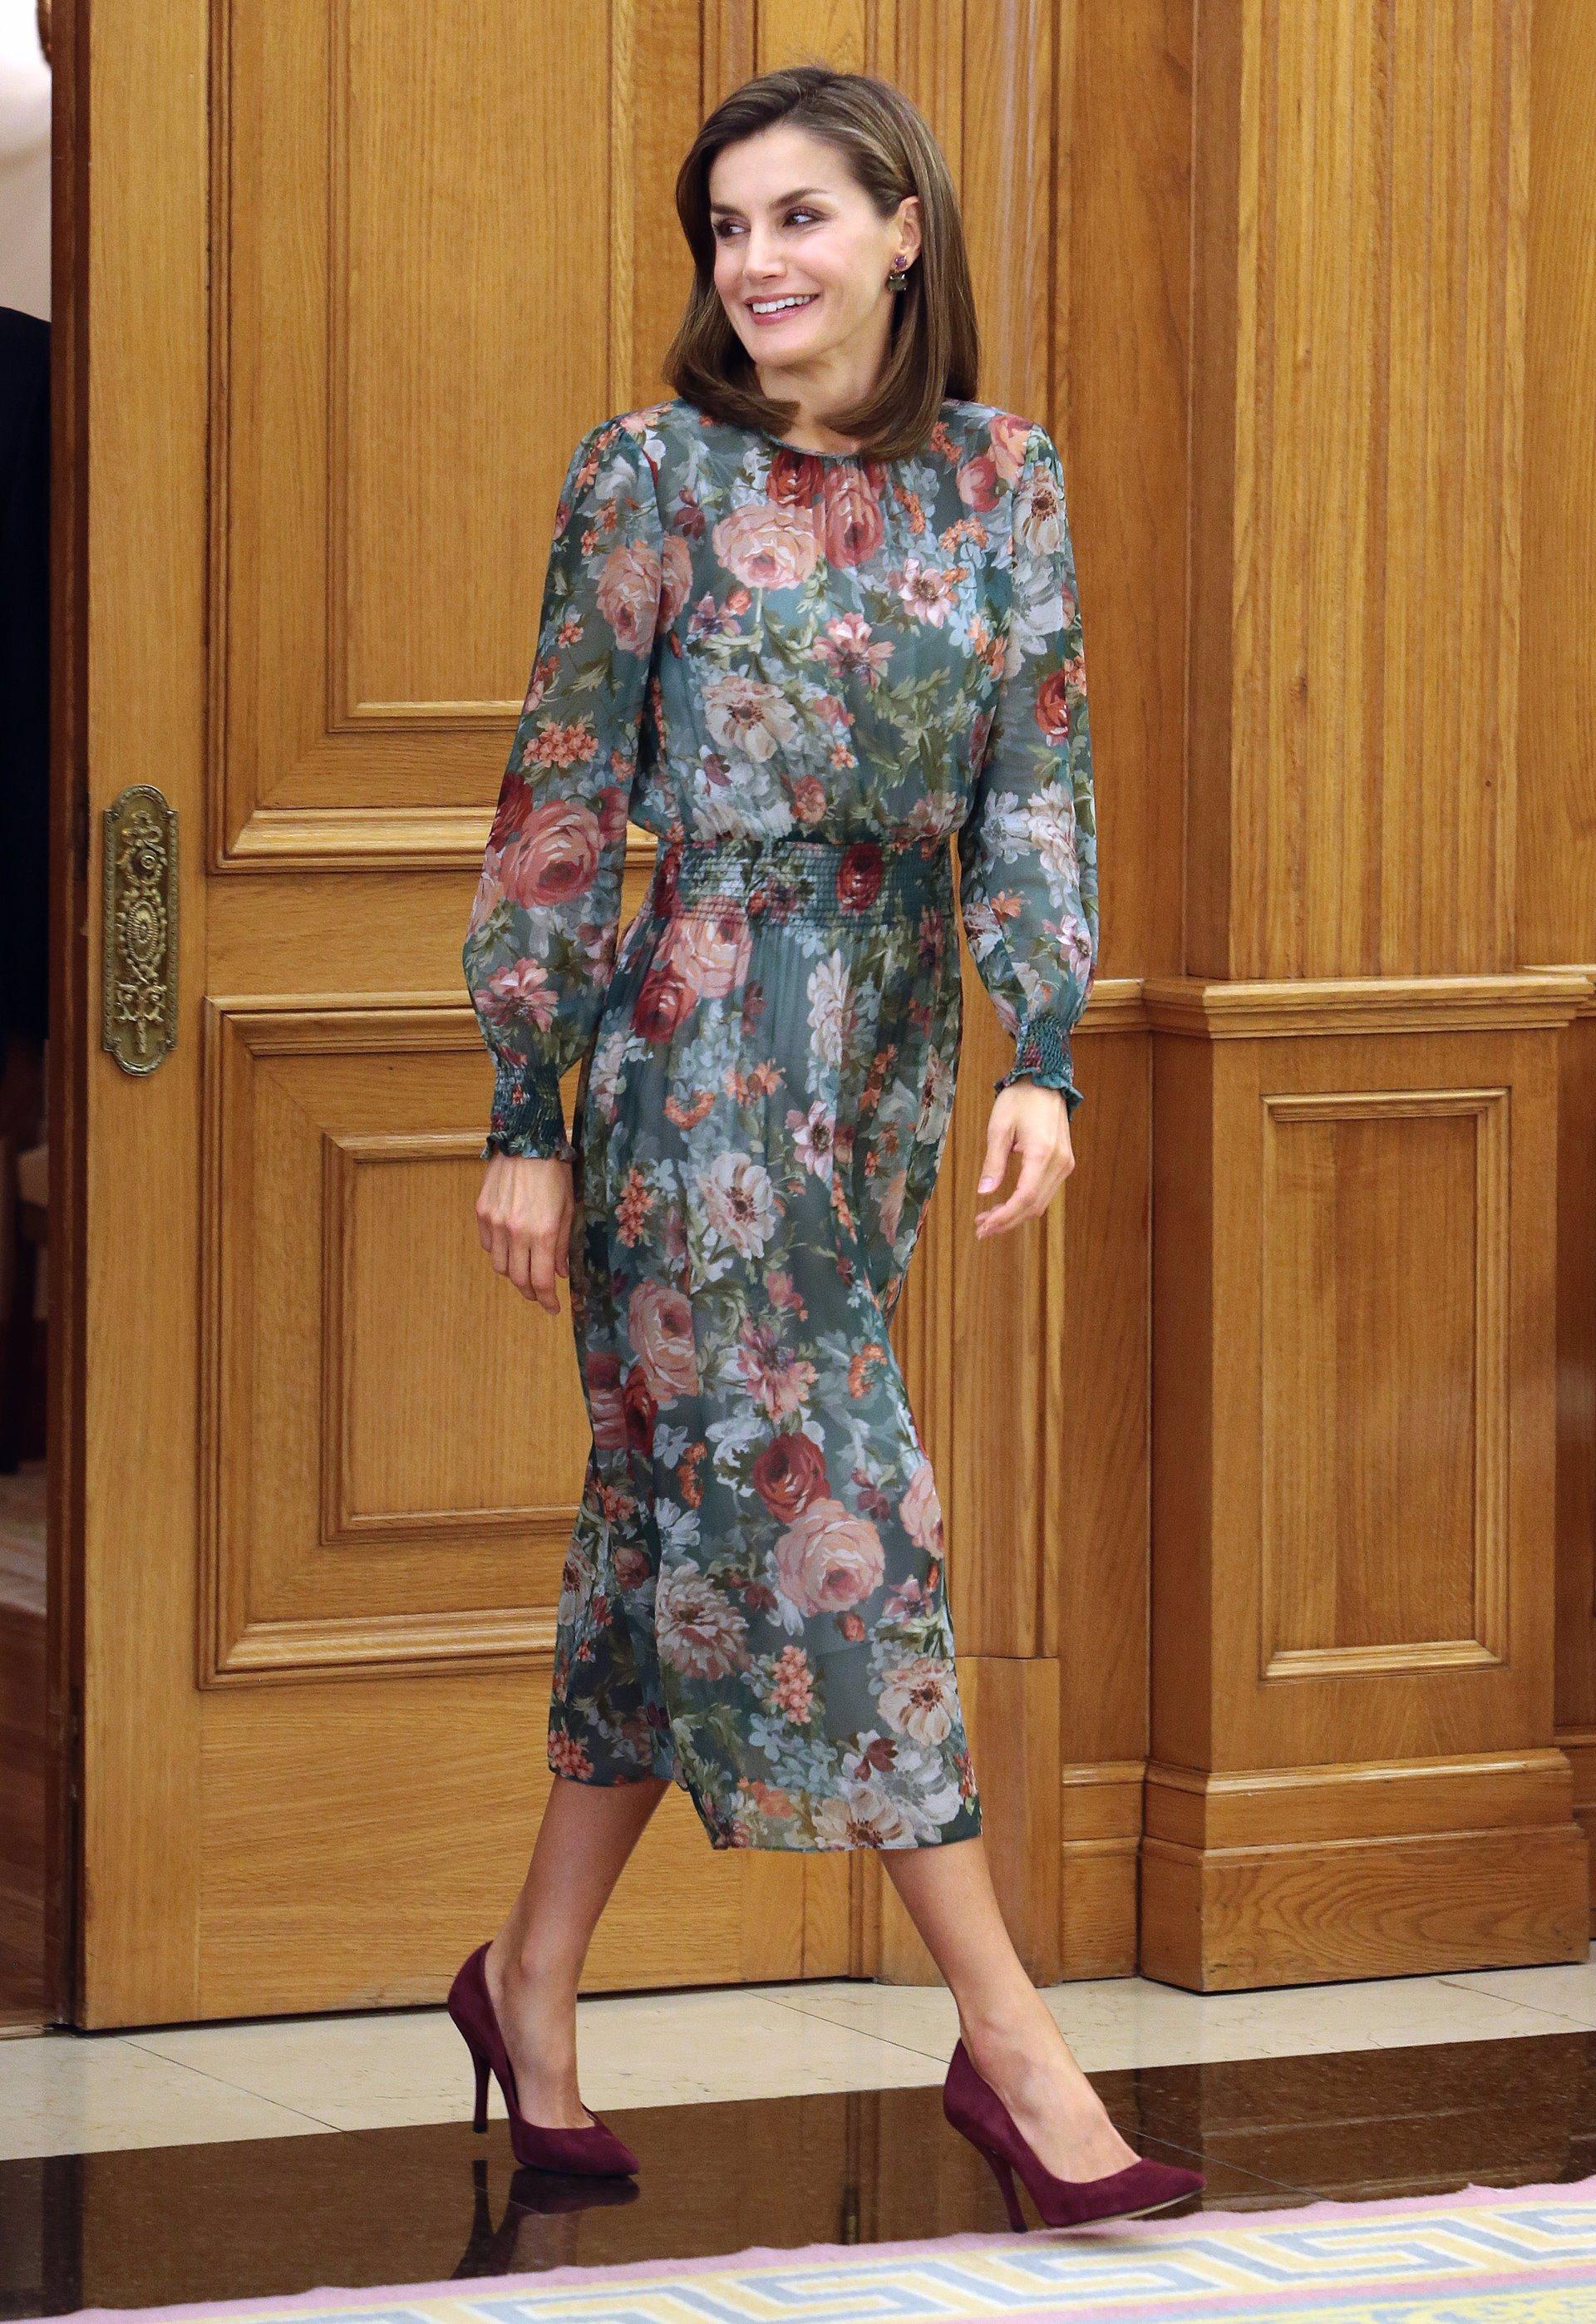 Letizia Vestido Zara De 50 La Reina Menos Euros Estrena Por SpqUzMVG